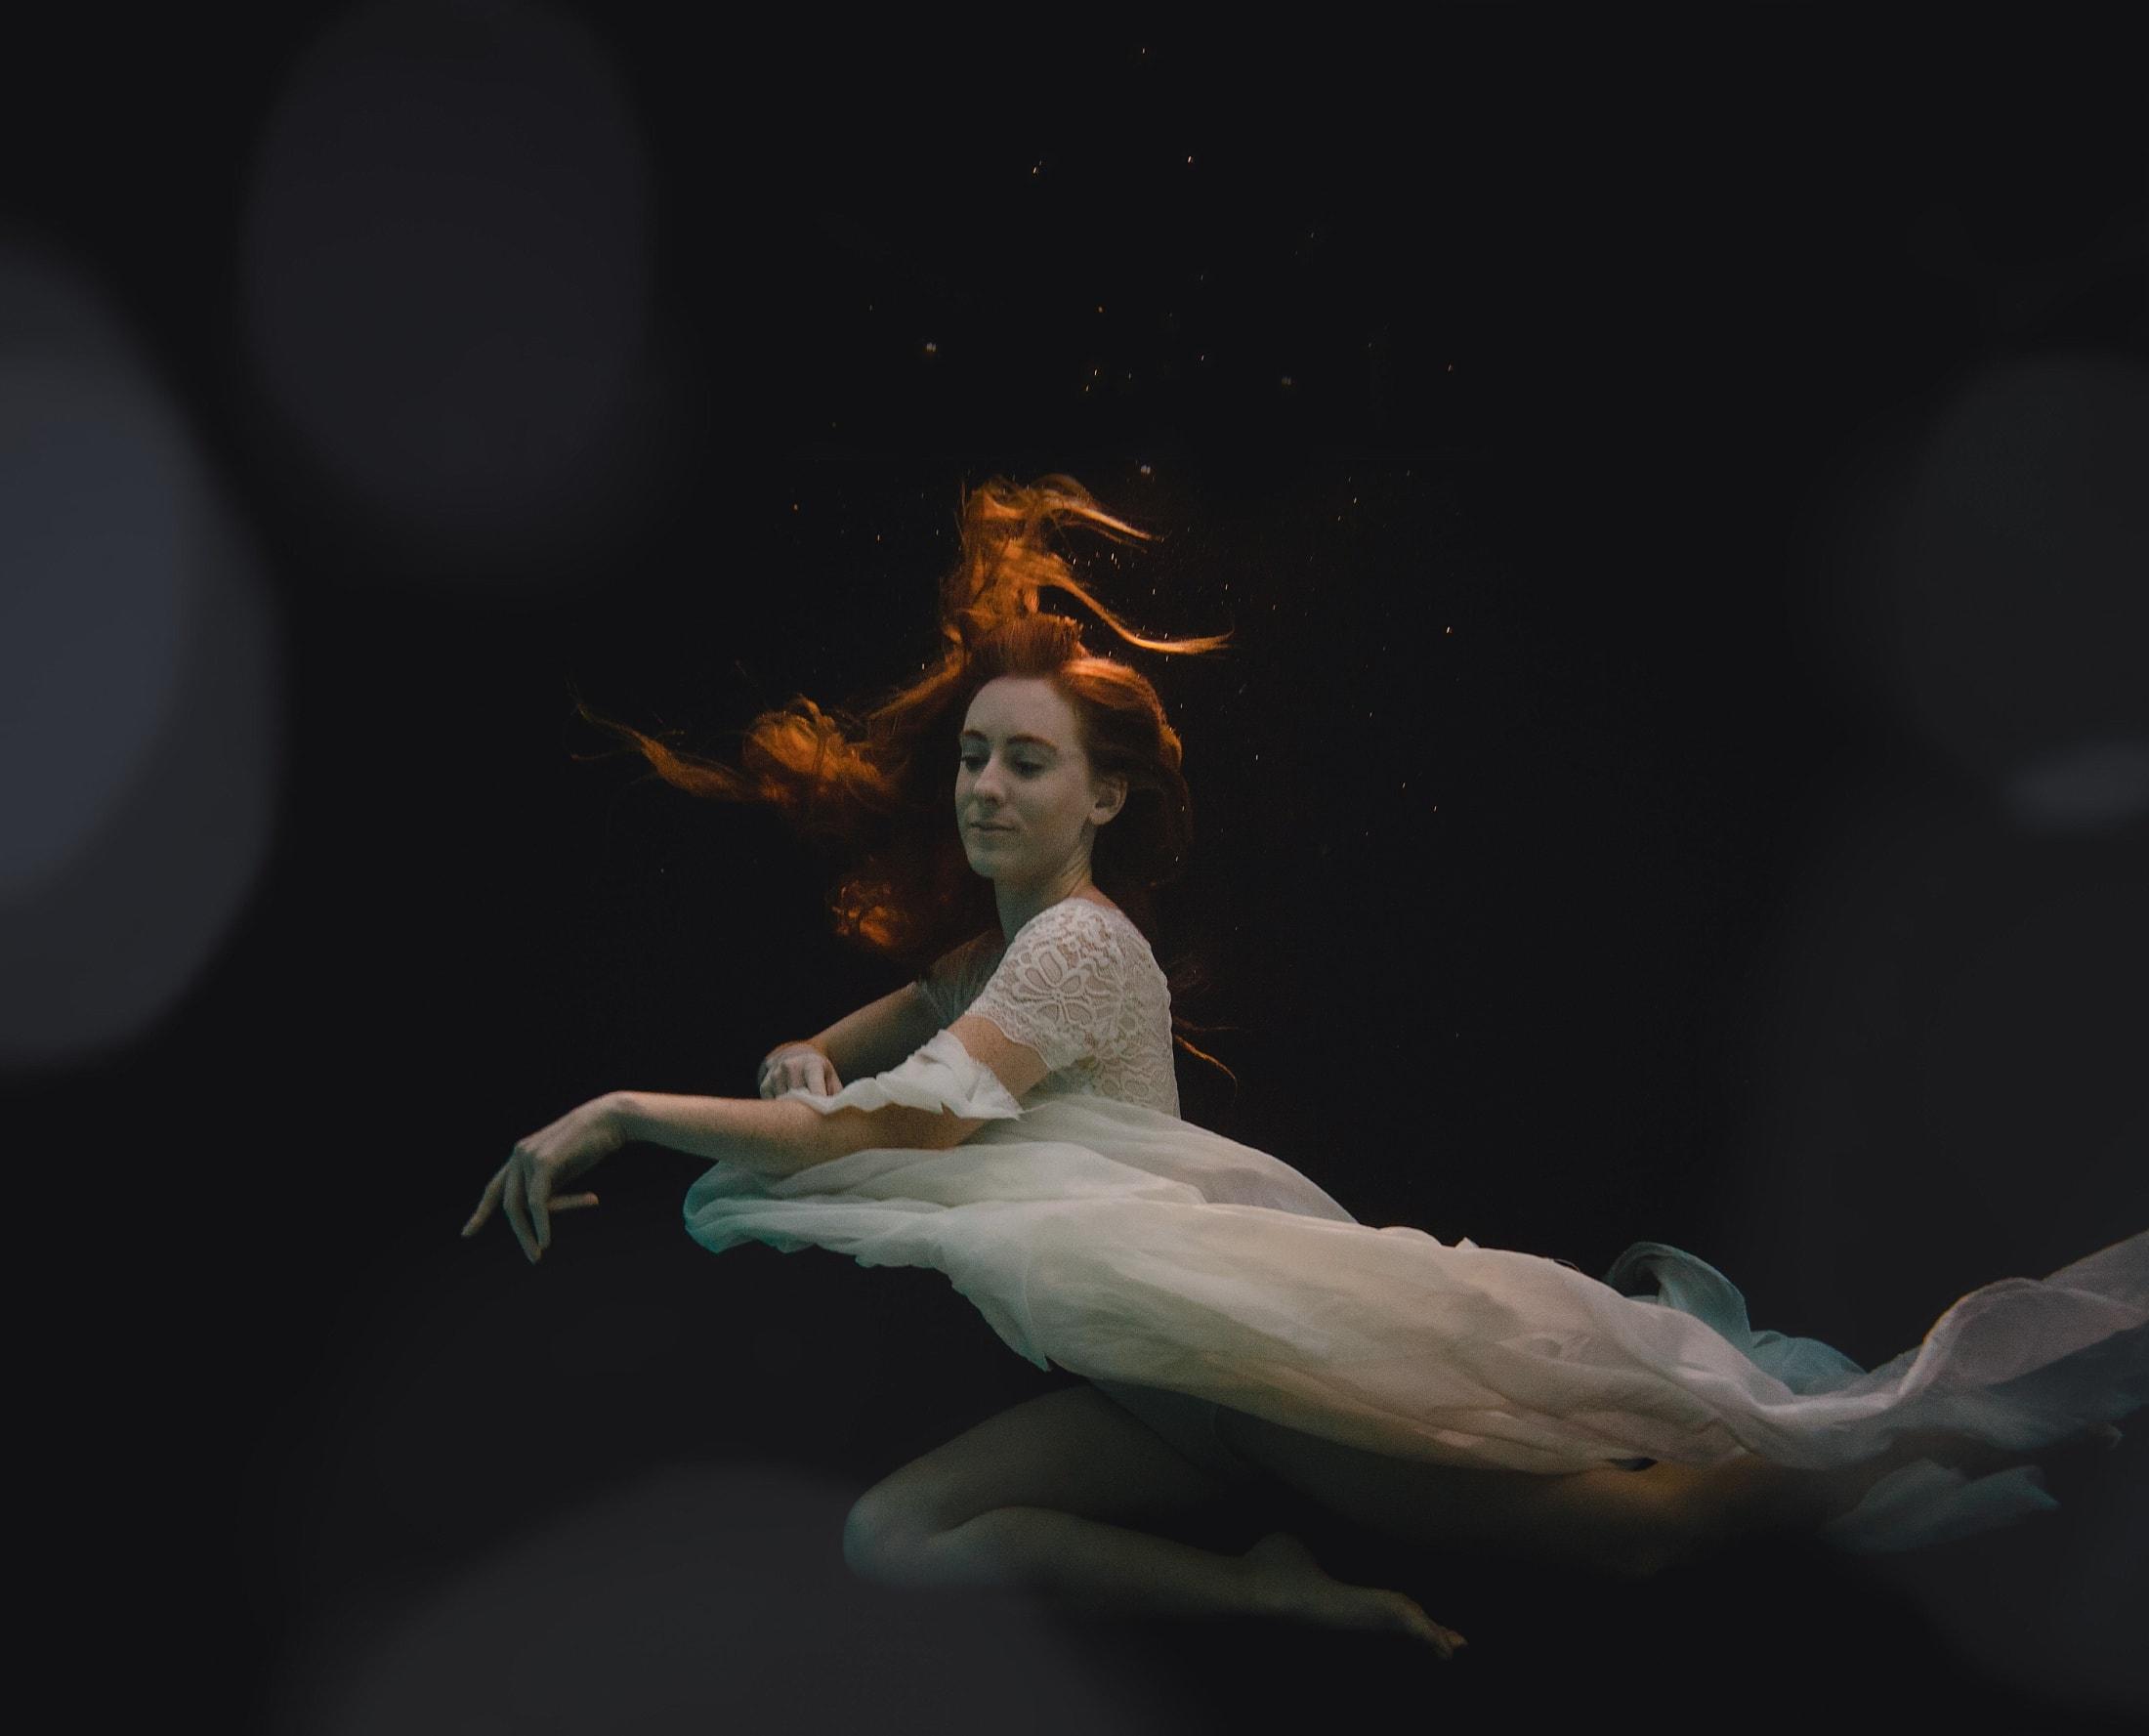 underwater dancer portraits in a pool